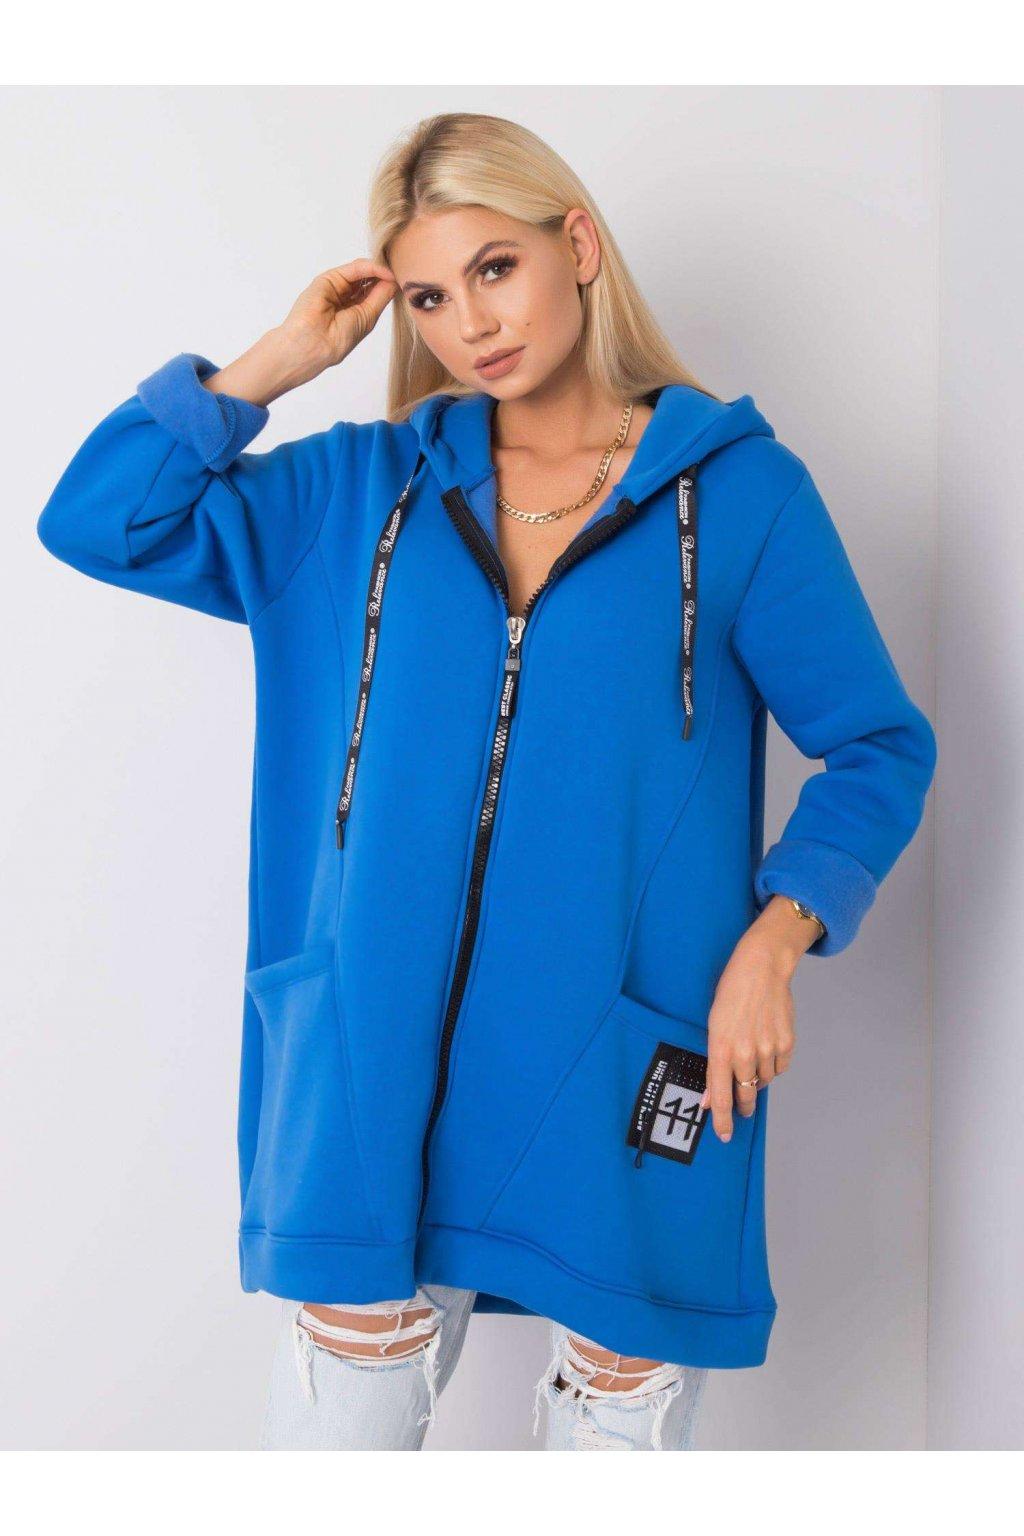 pol pl Niebieska bluza Serena 356046 1